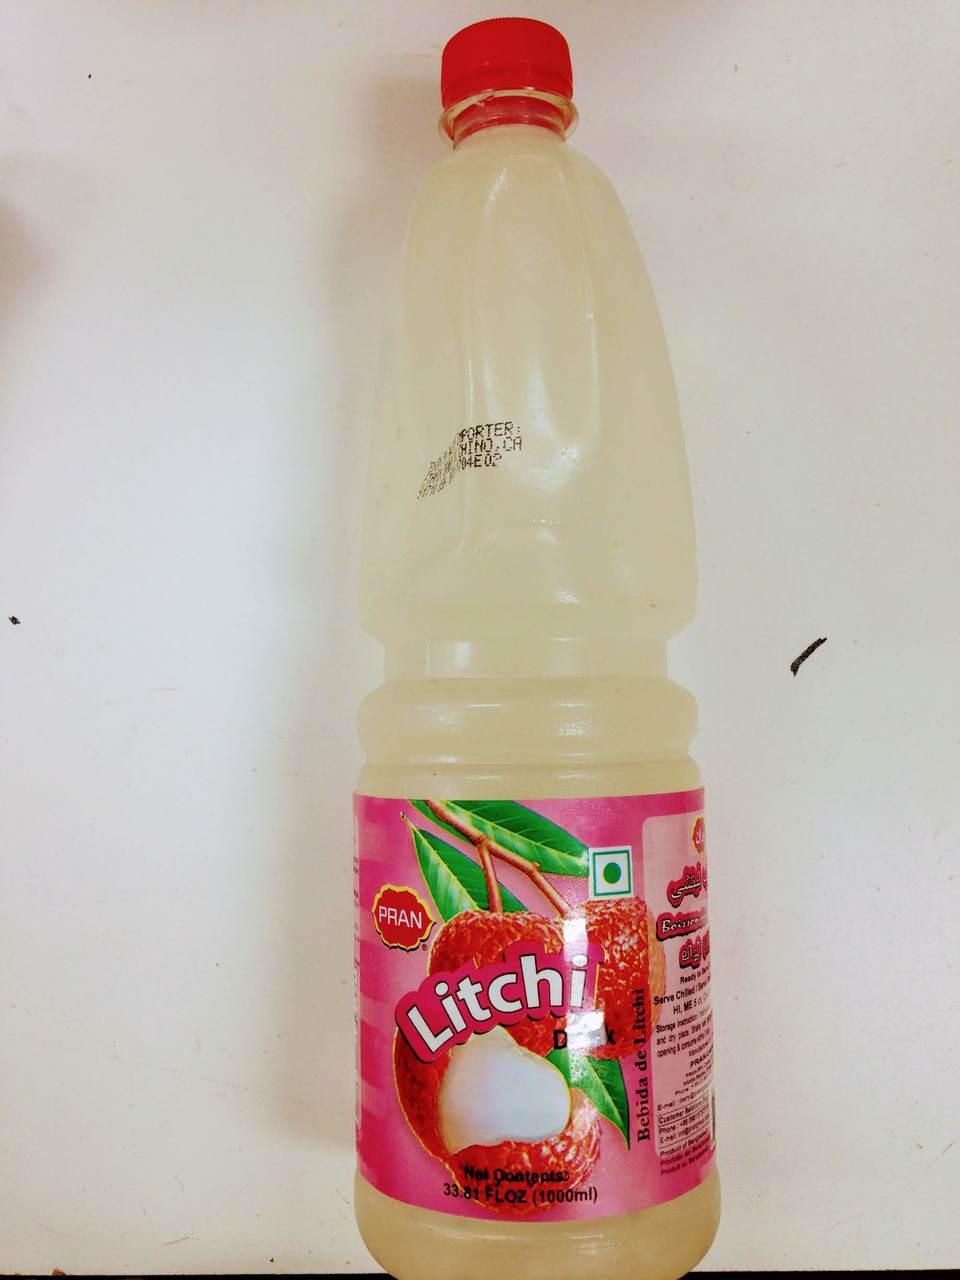 Pran Litchi Juice - 1000ml